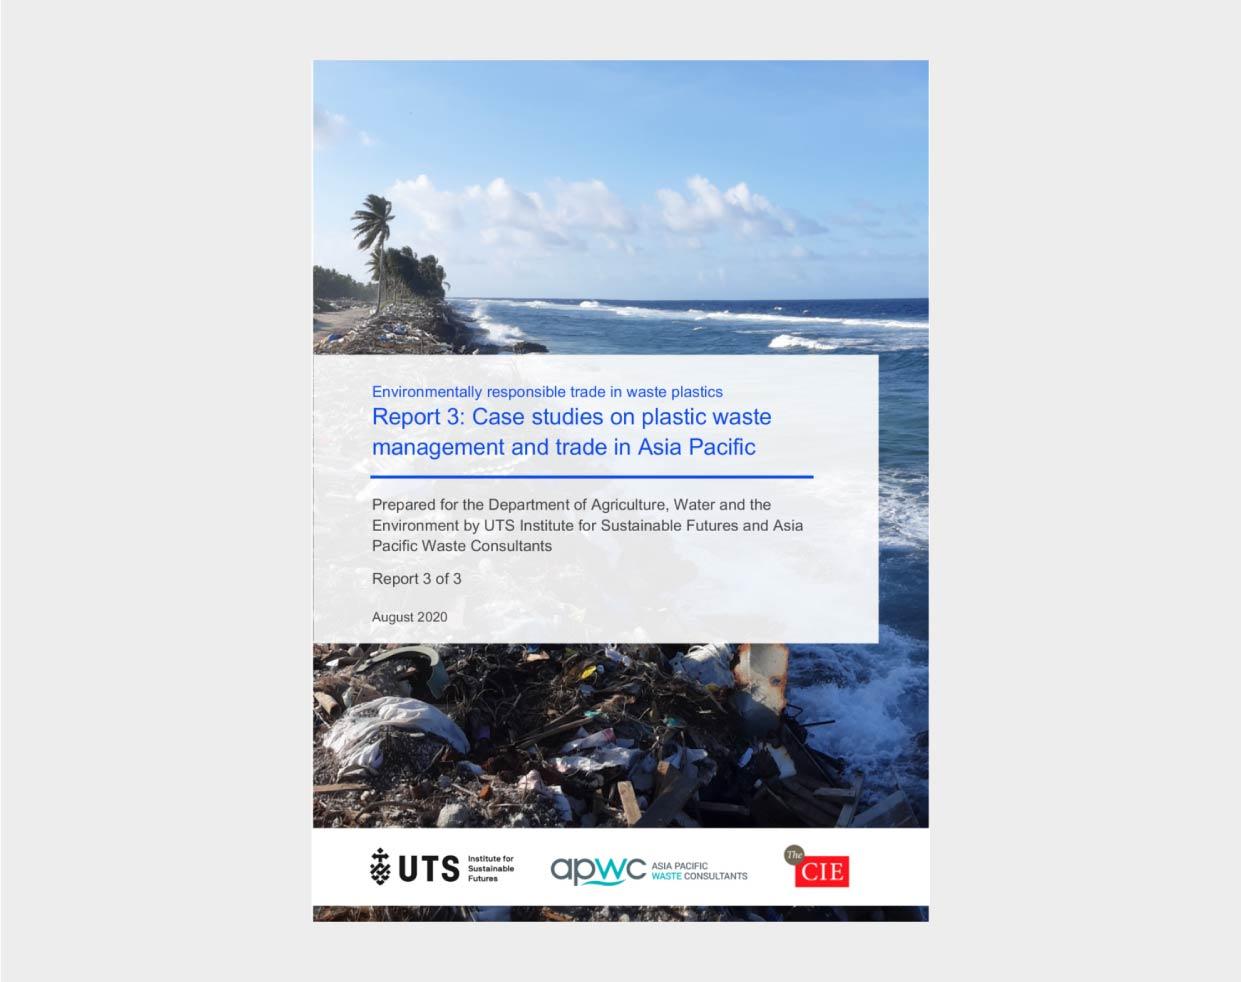 Environmentally responsible trade in waste plastics - Report 3